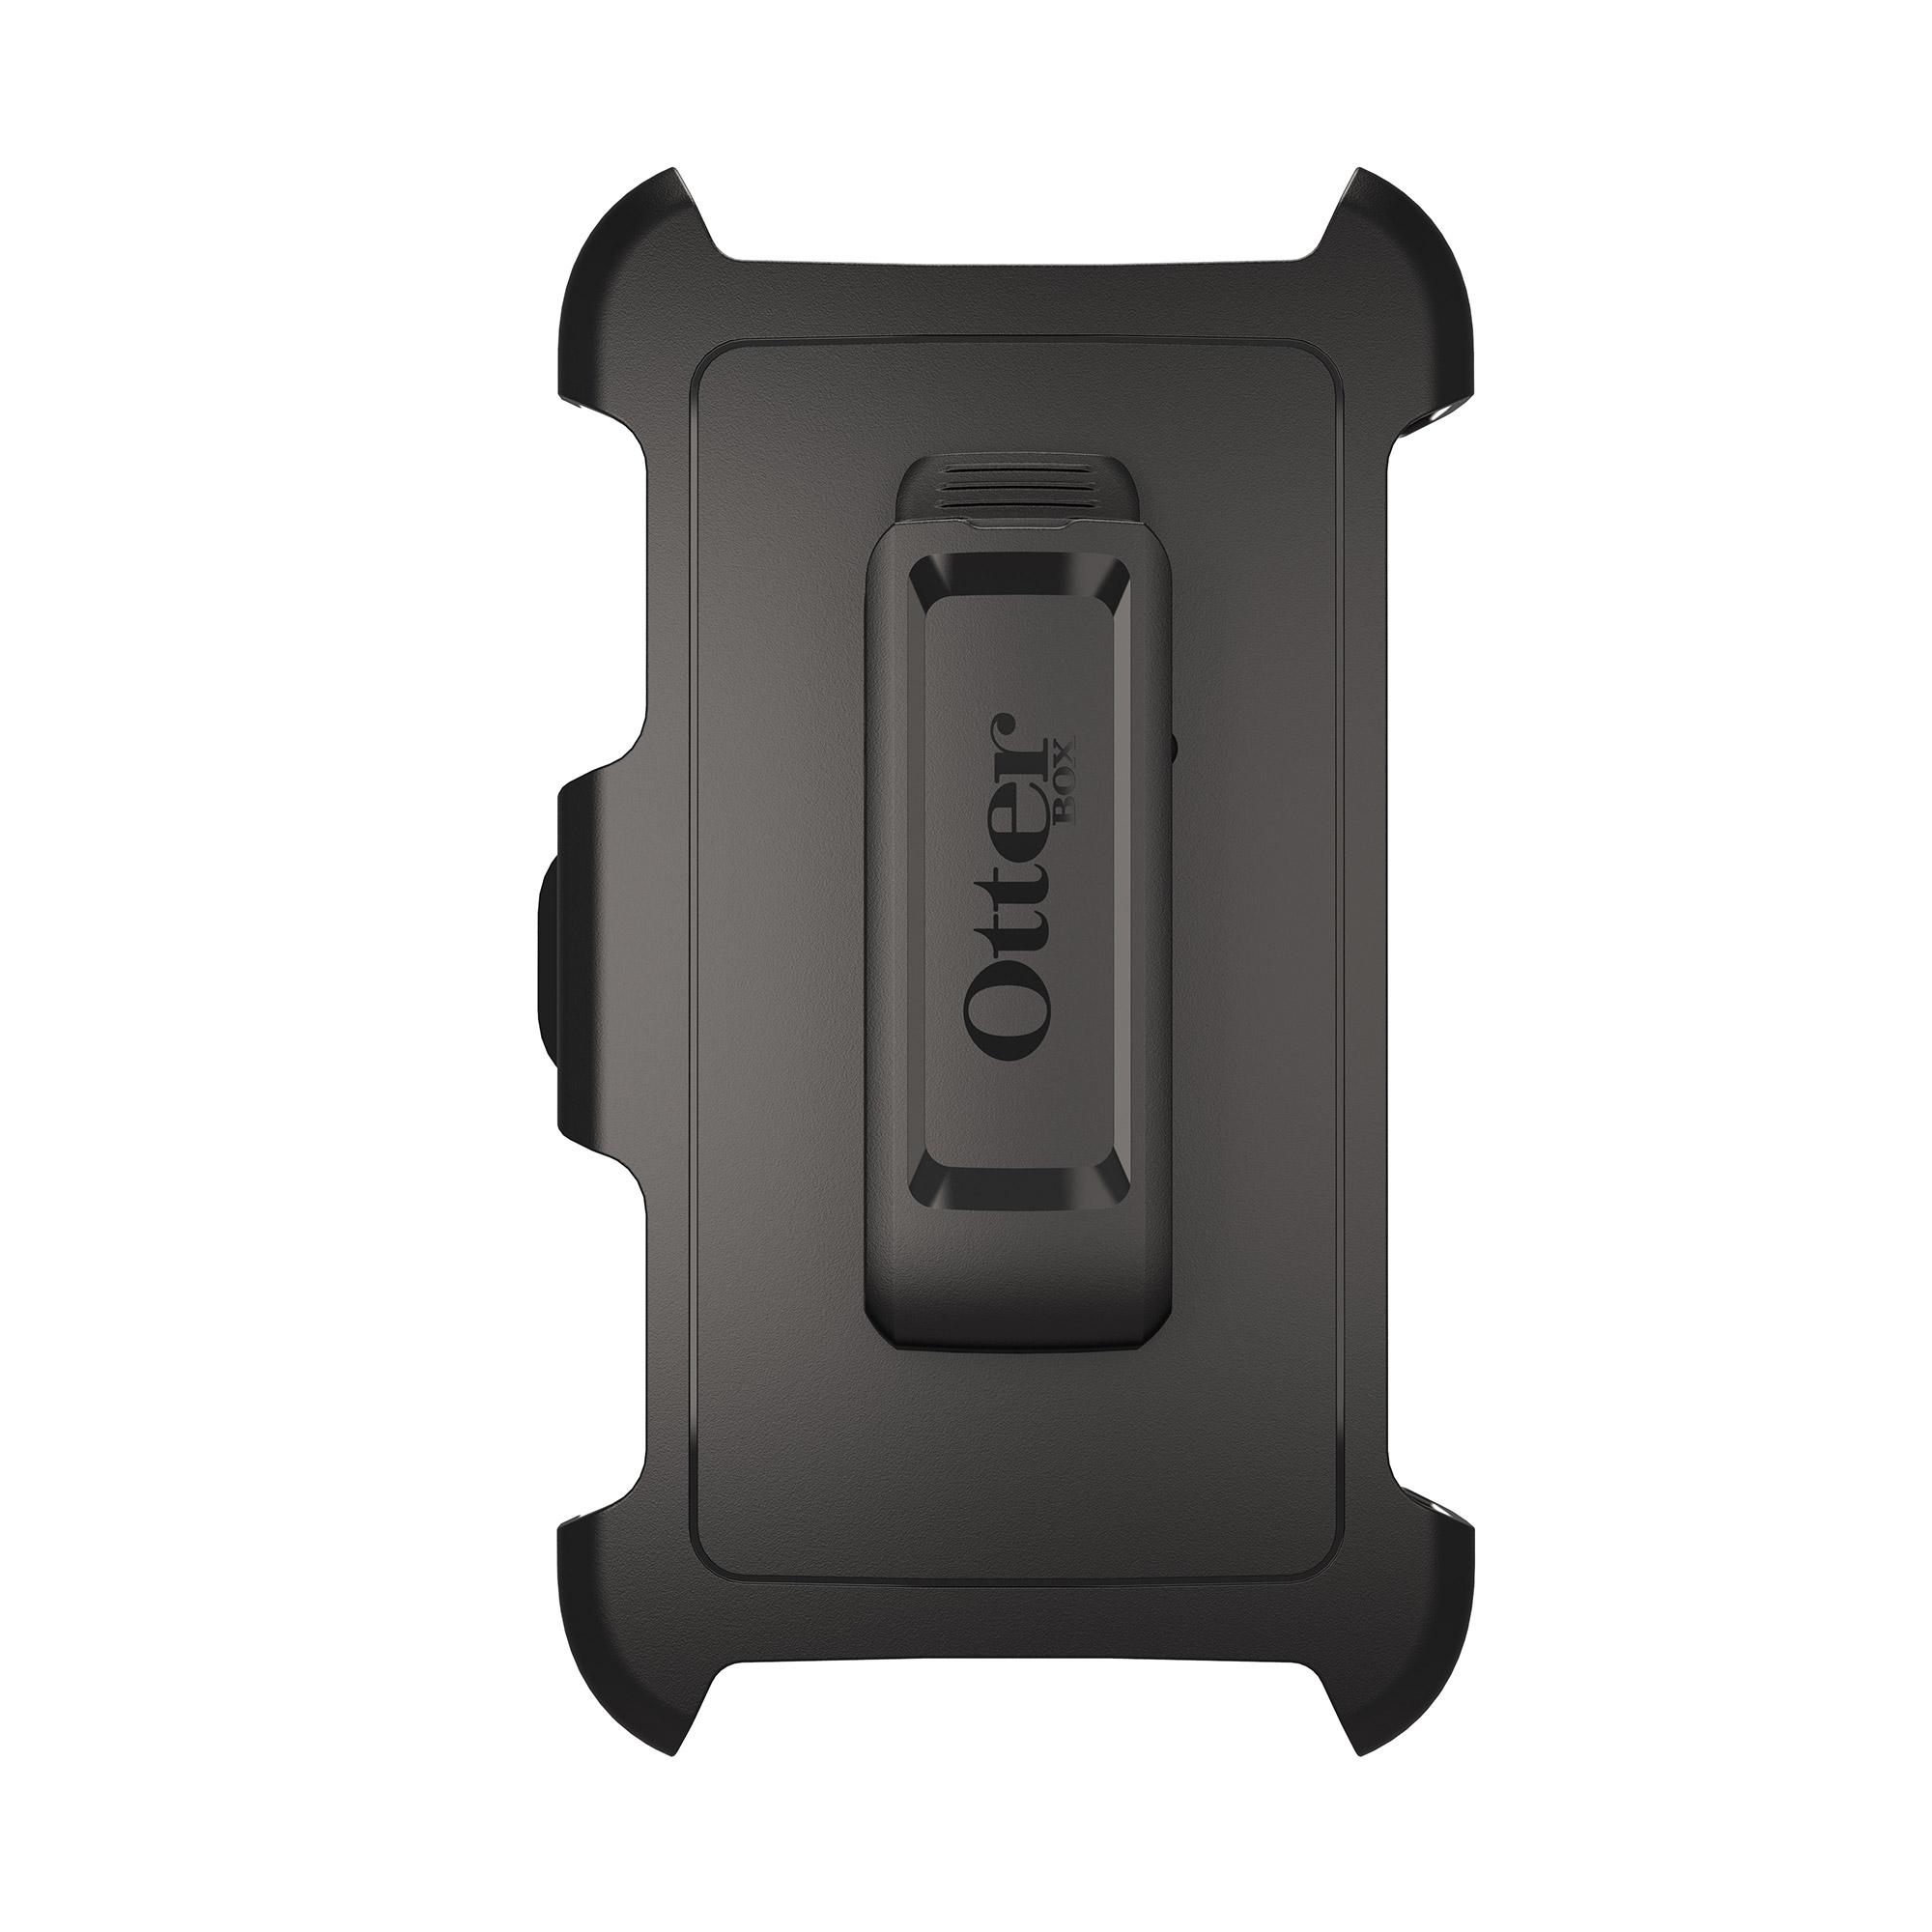 OtterBox Samsung GALAXY S5 Defender Series Holster